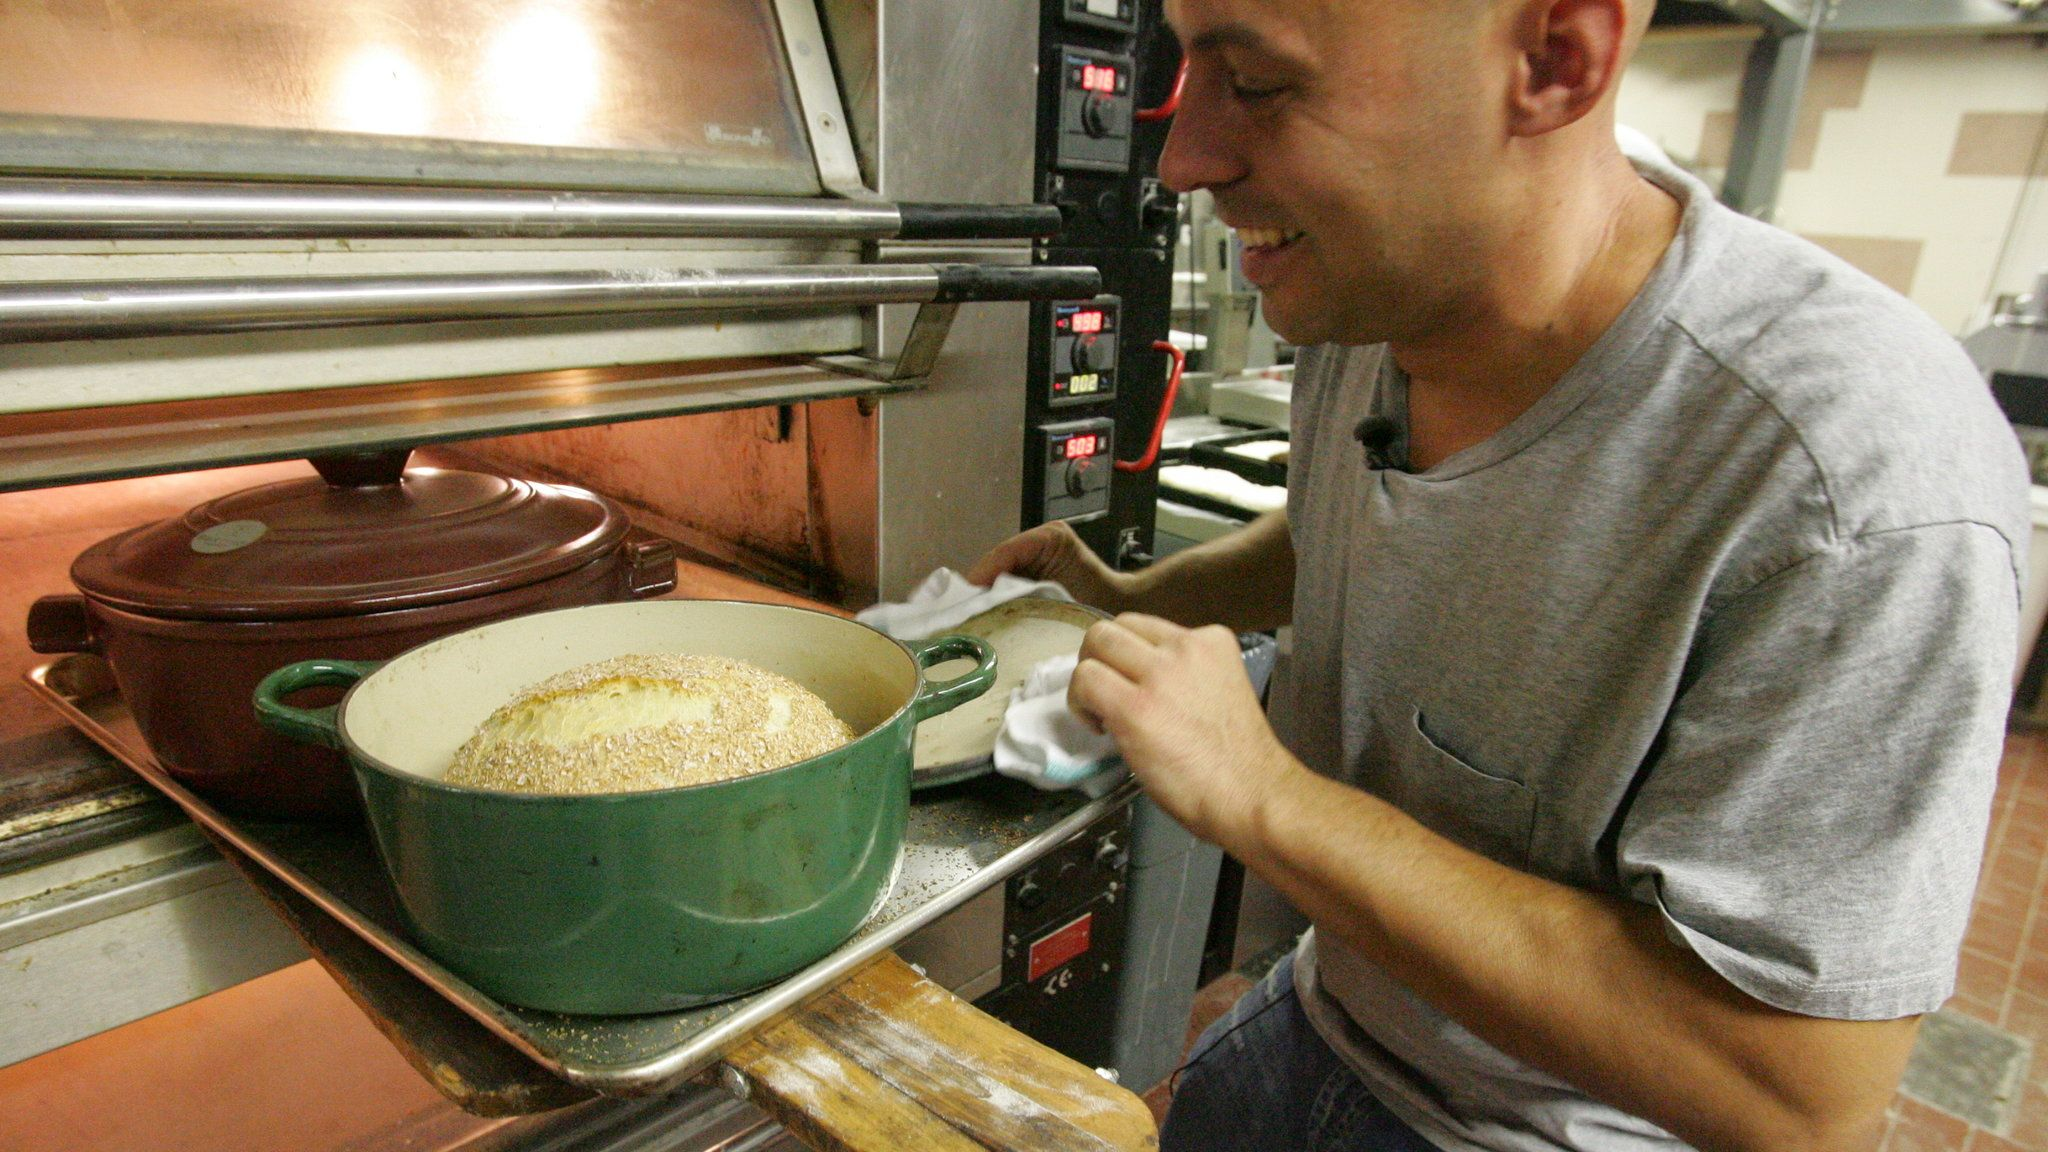 Speedy No Knead Bread Recipe Recipe No Knead Bread Knead Bread Recipe Nyt Cooking